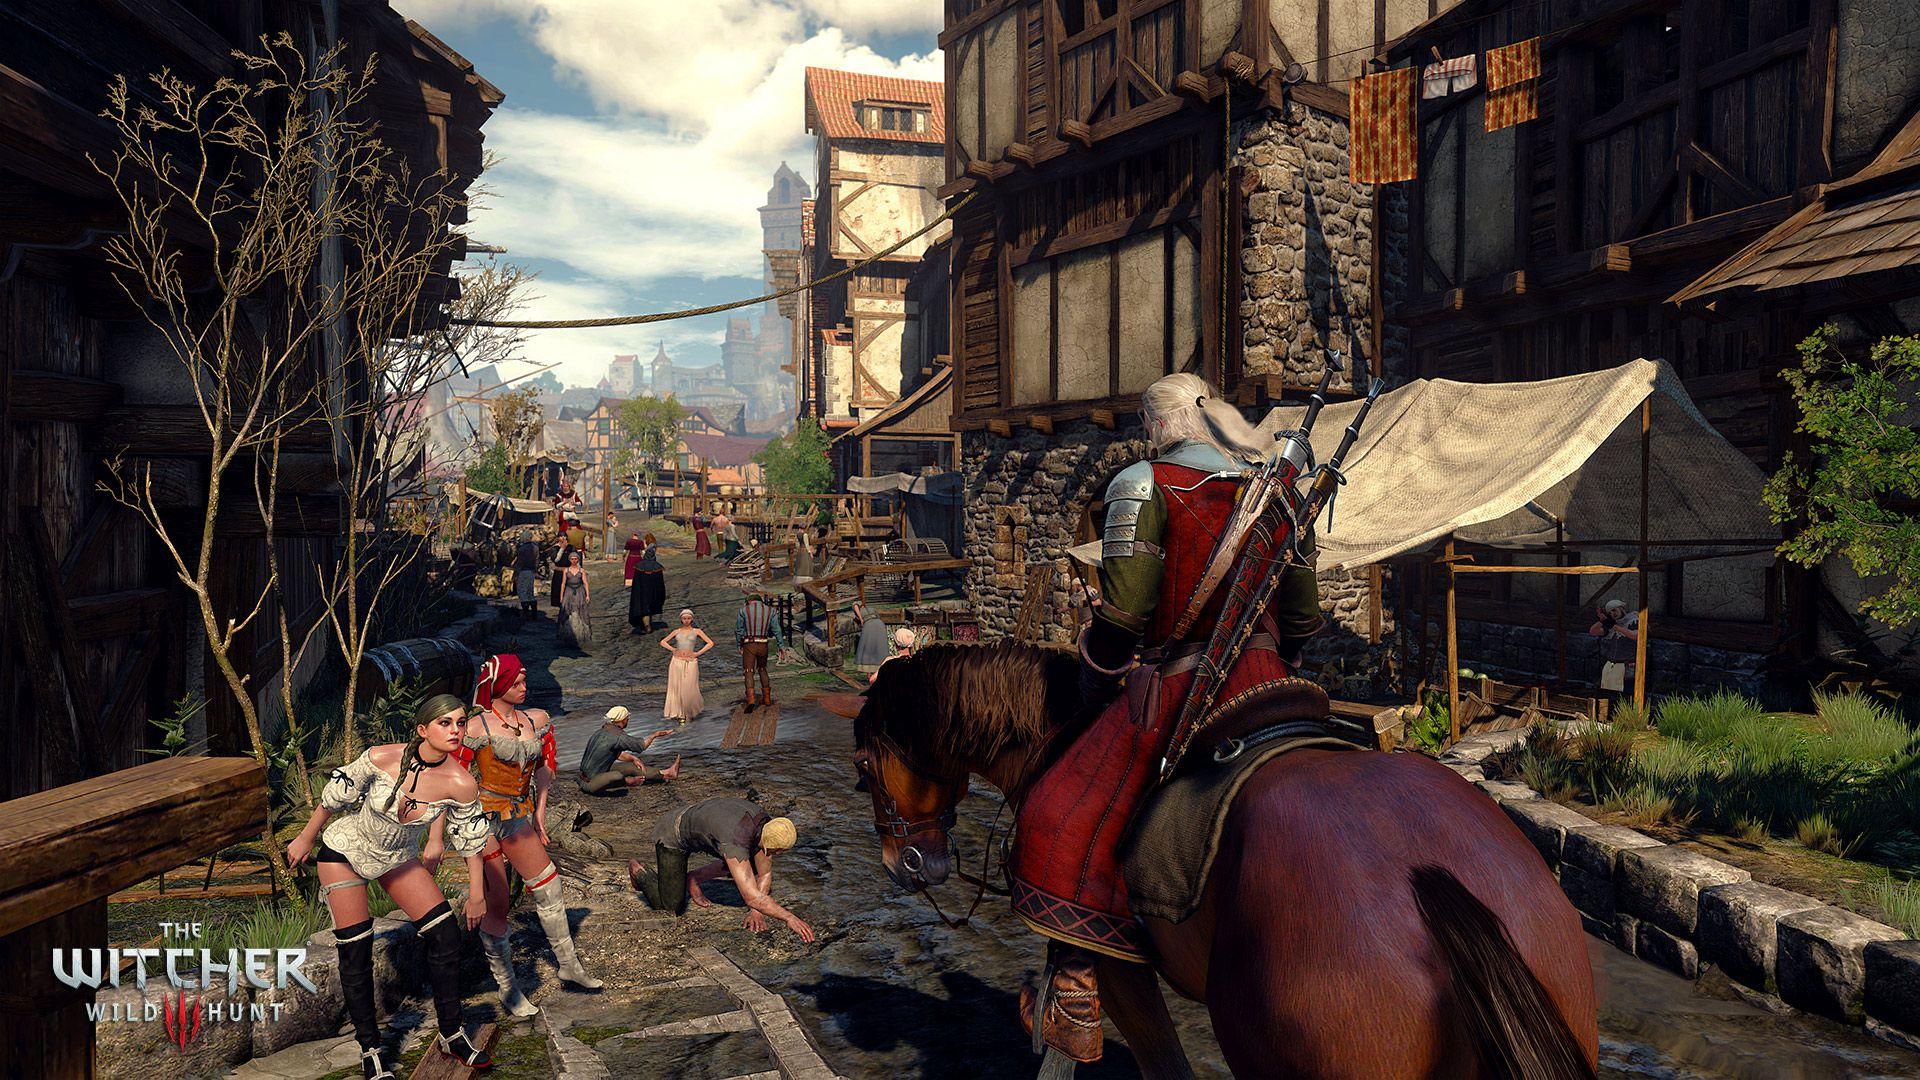 gaming the witchers 3 screenshot 07 - The Witcher: uno sguardo al mondo di Geralt, oltre la serie Netflix